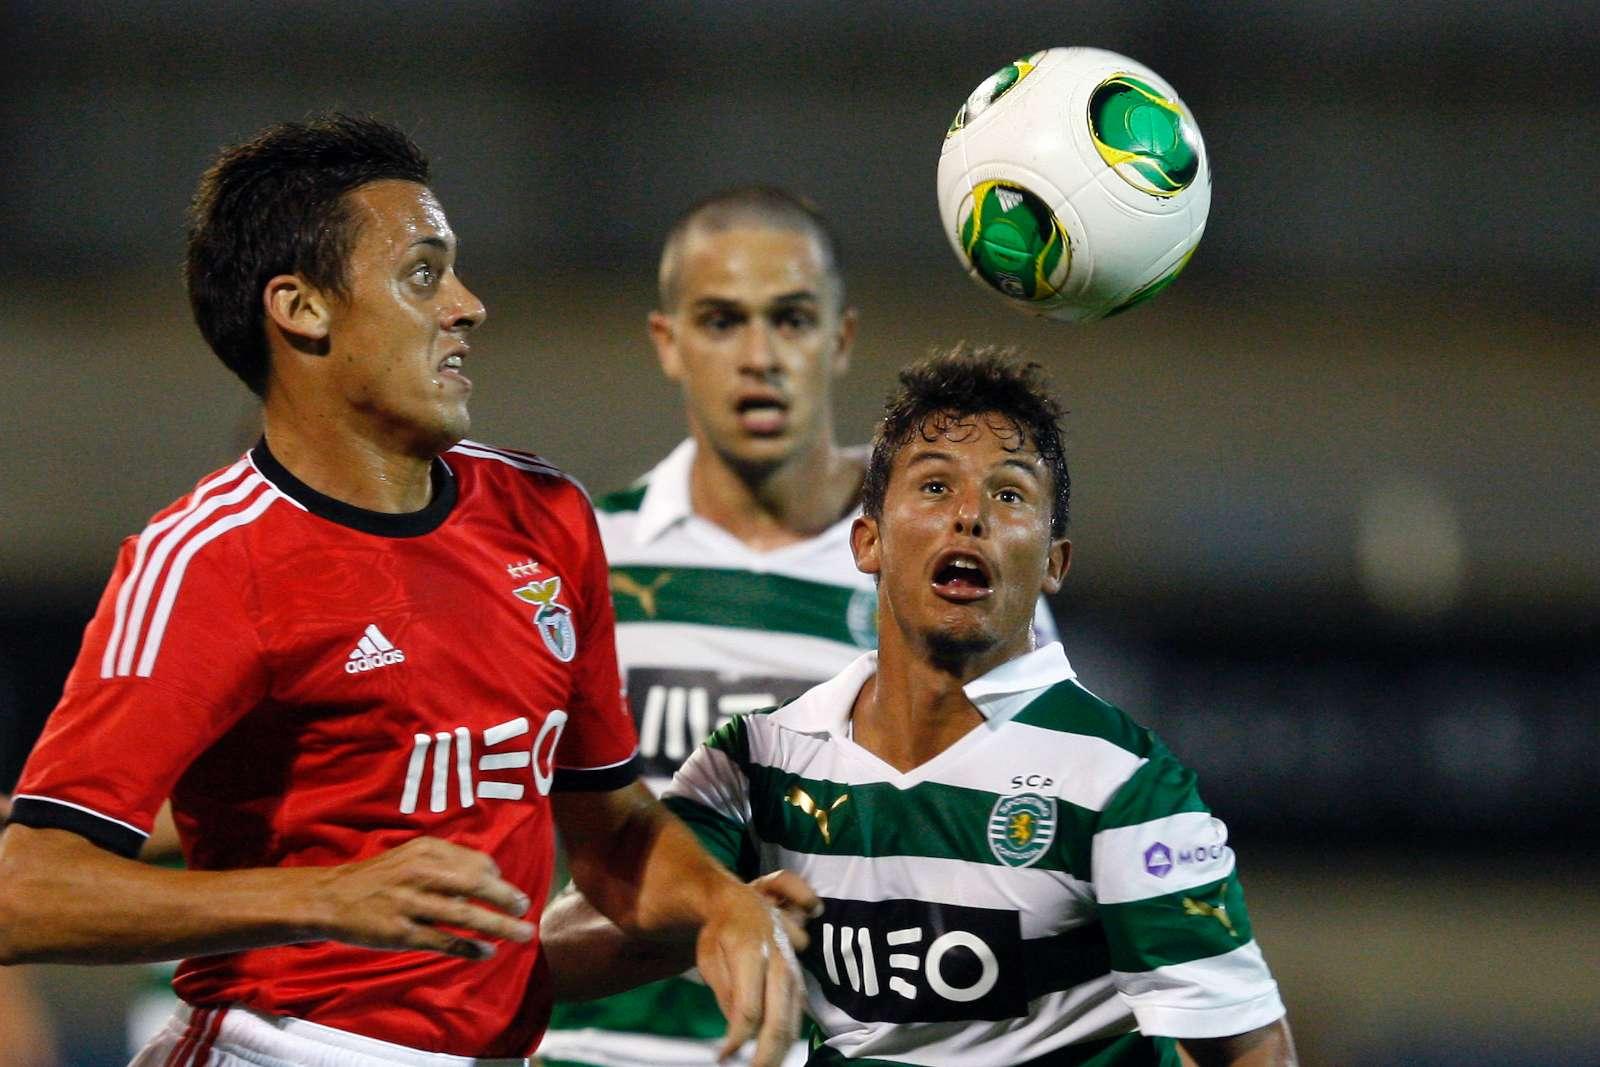 Benfica-Sporting: Uros Matic contra Kikas